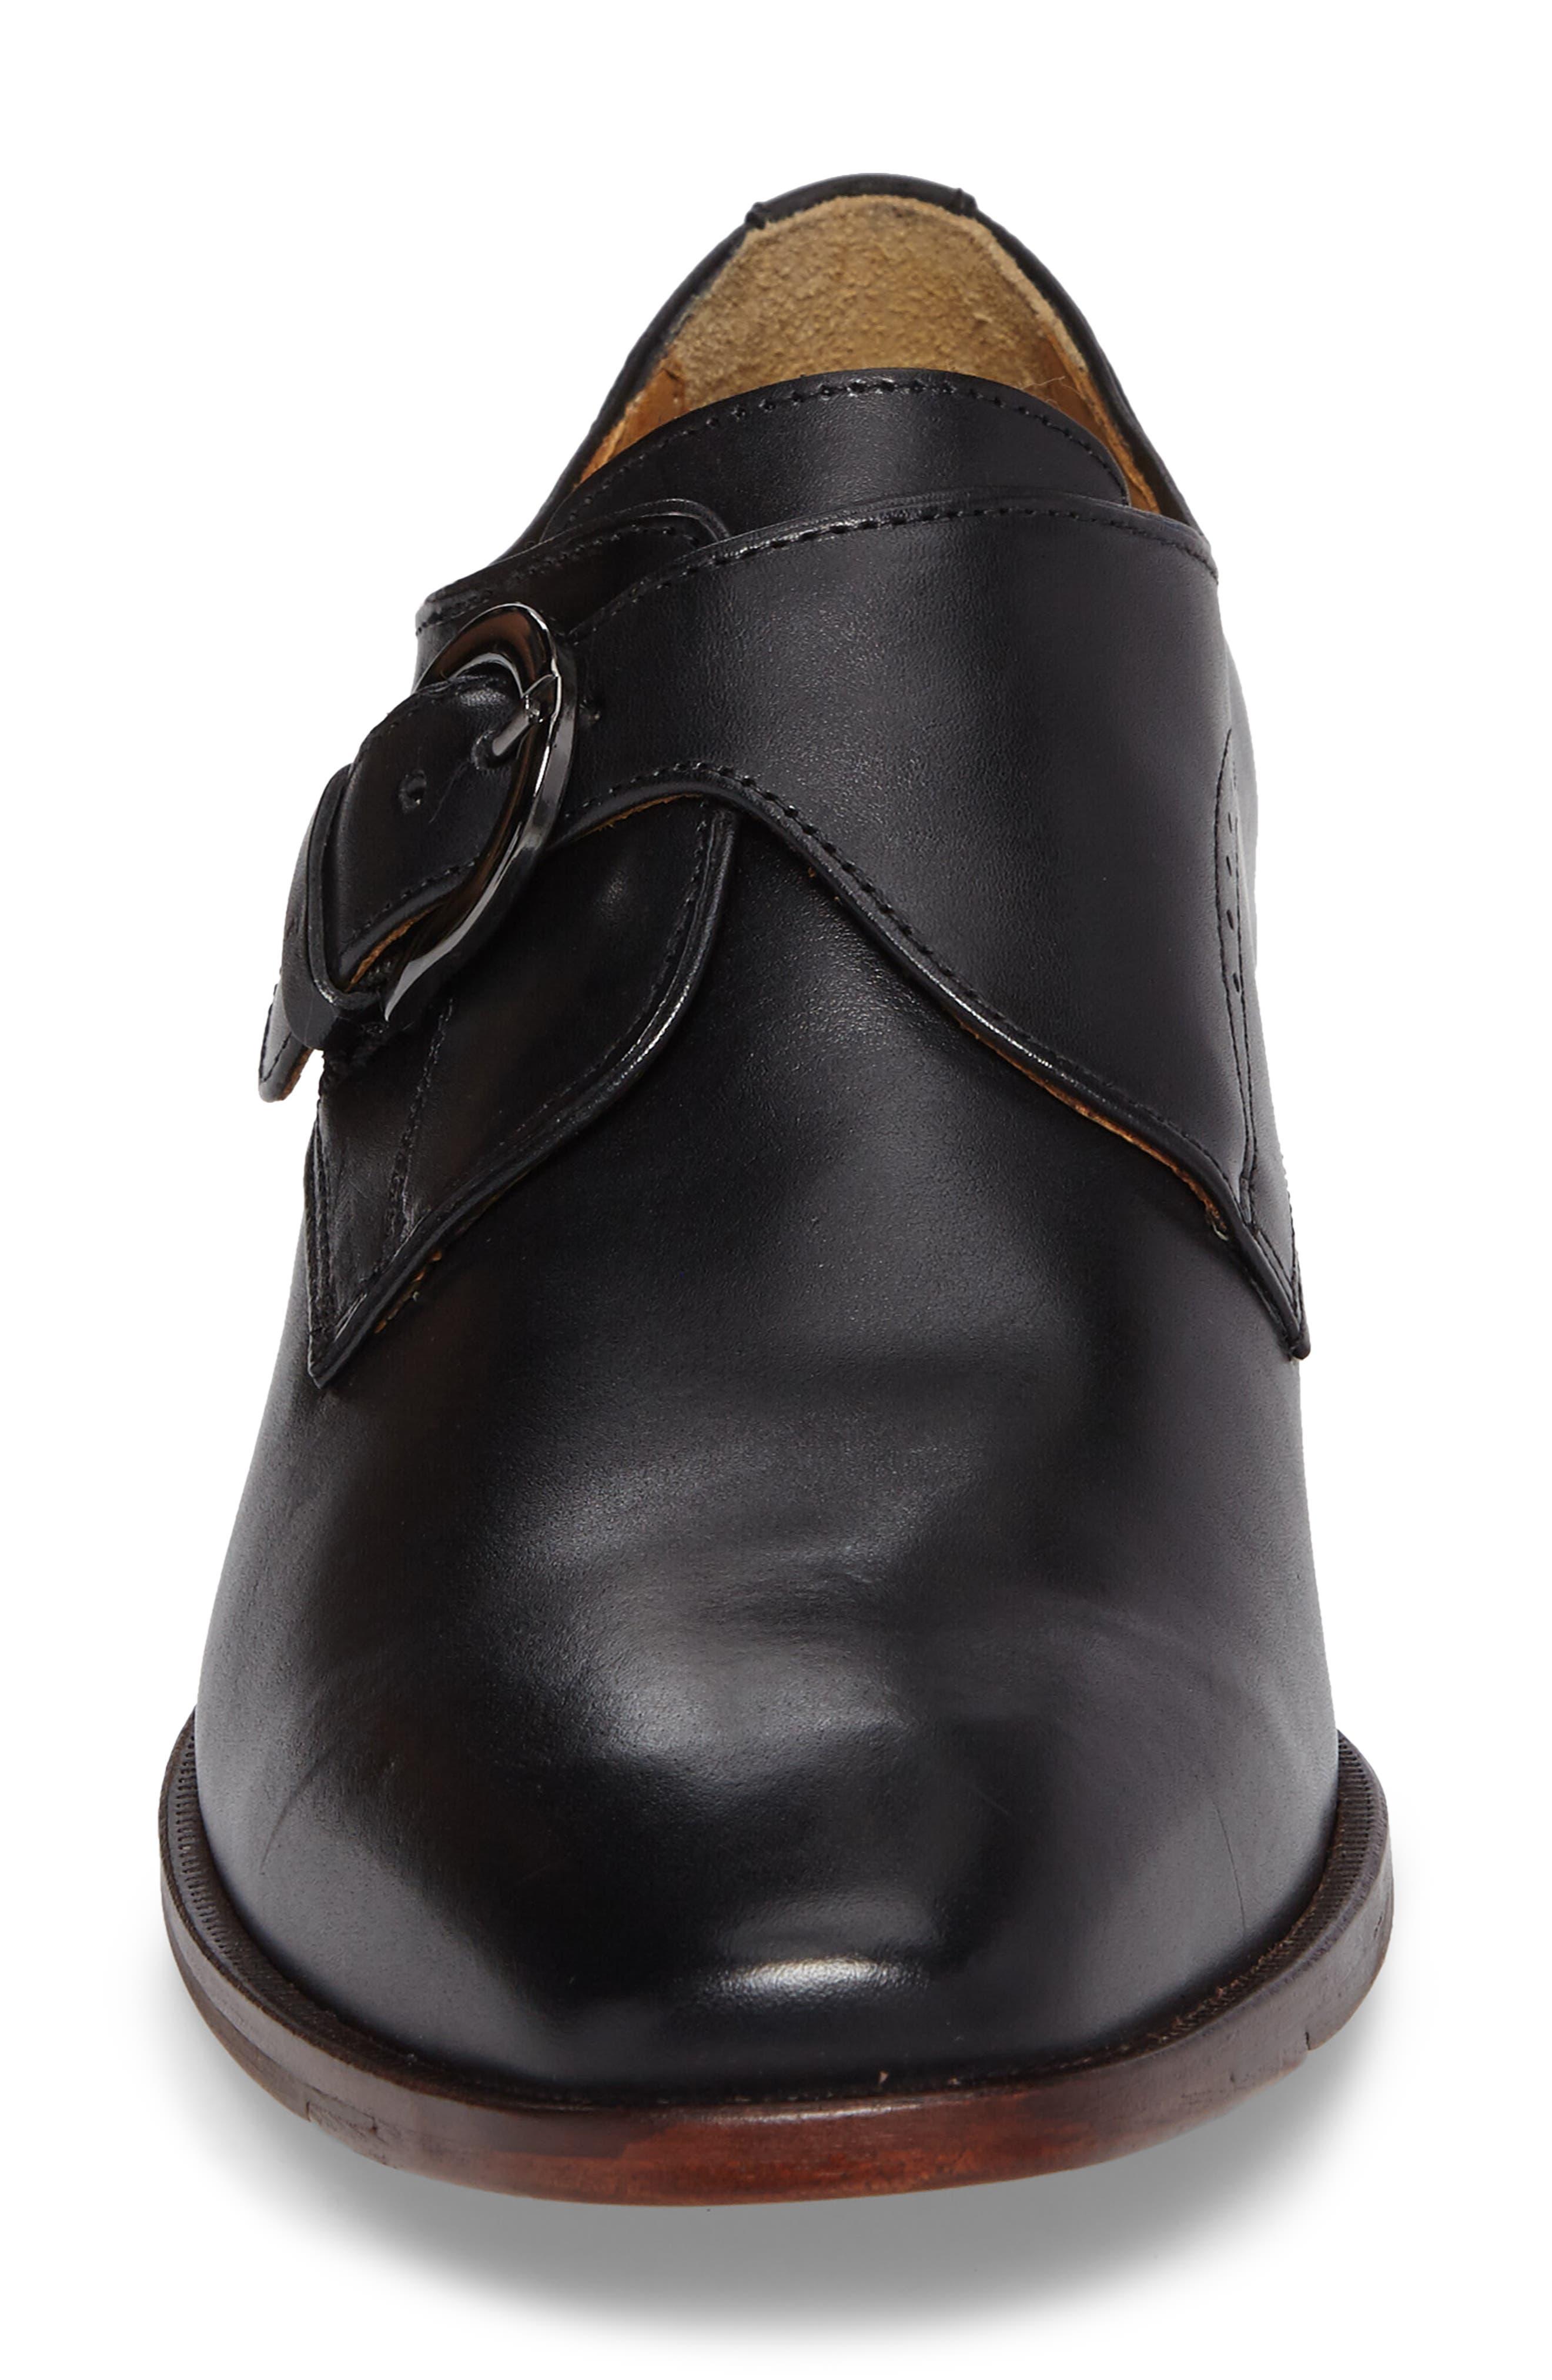 JOHNSTON & MURPHY, McClain Monk Strap Shoe, Alternate thumbnail 4, color, BLACK